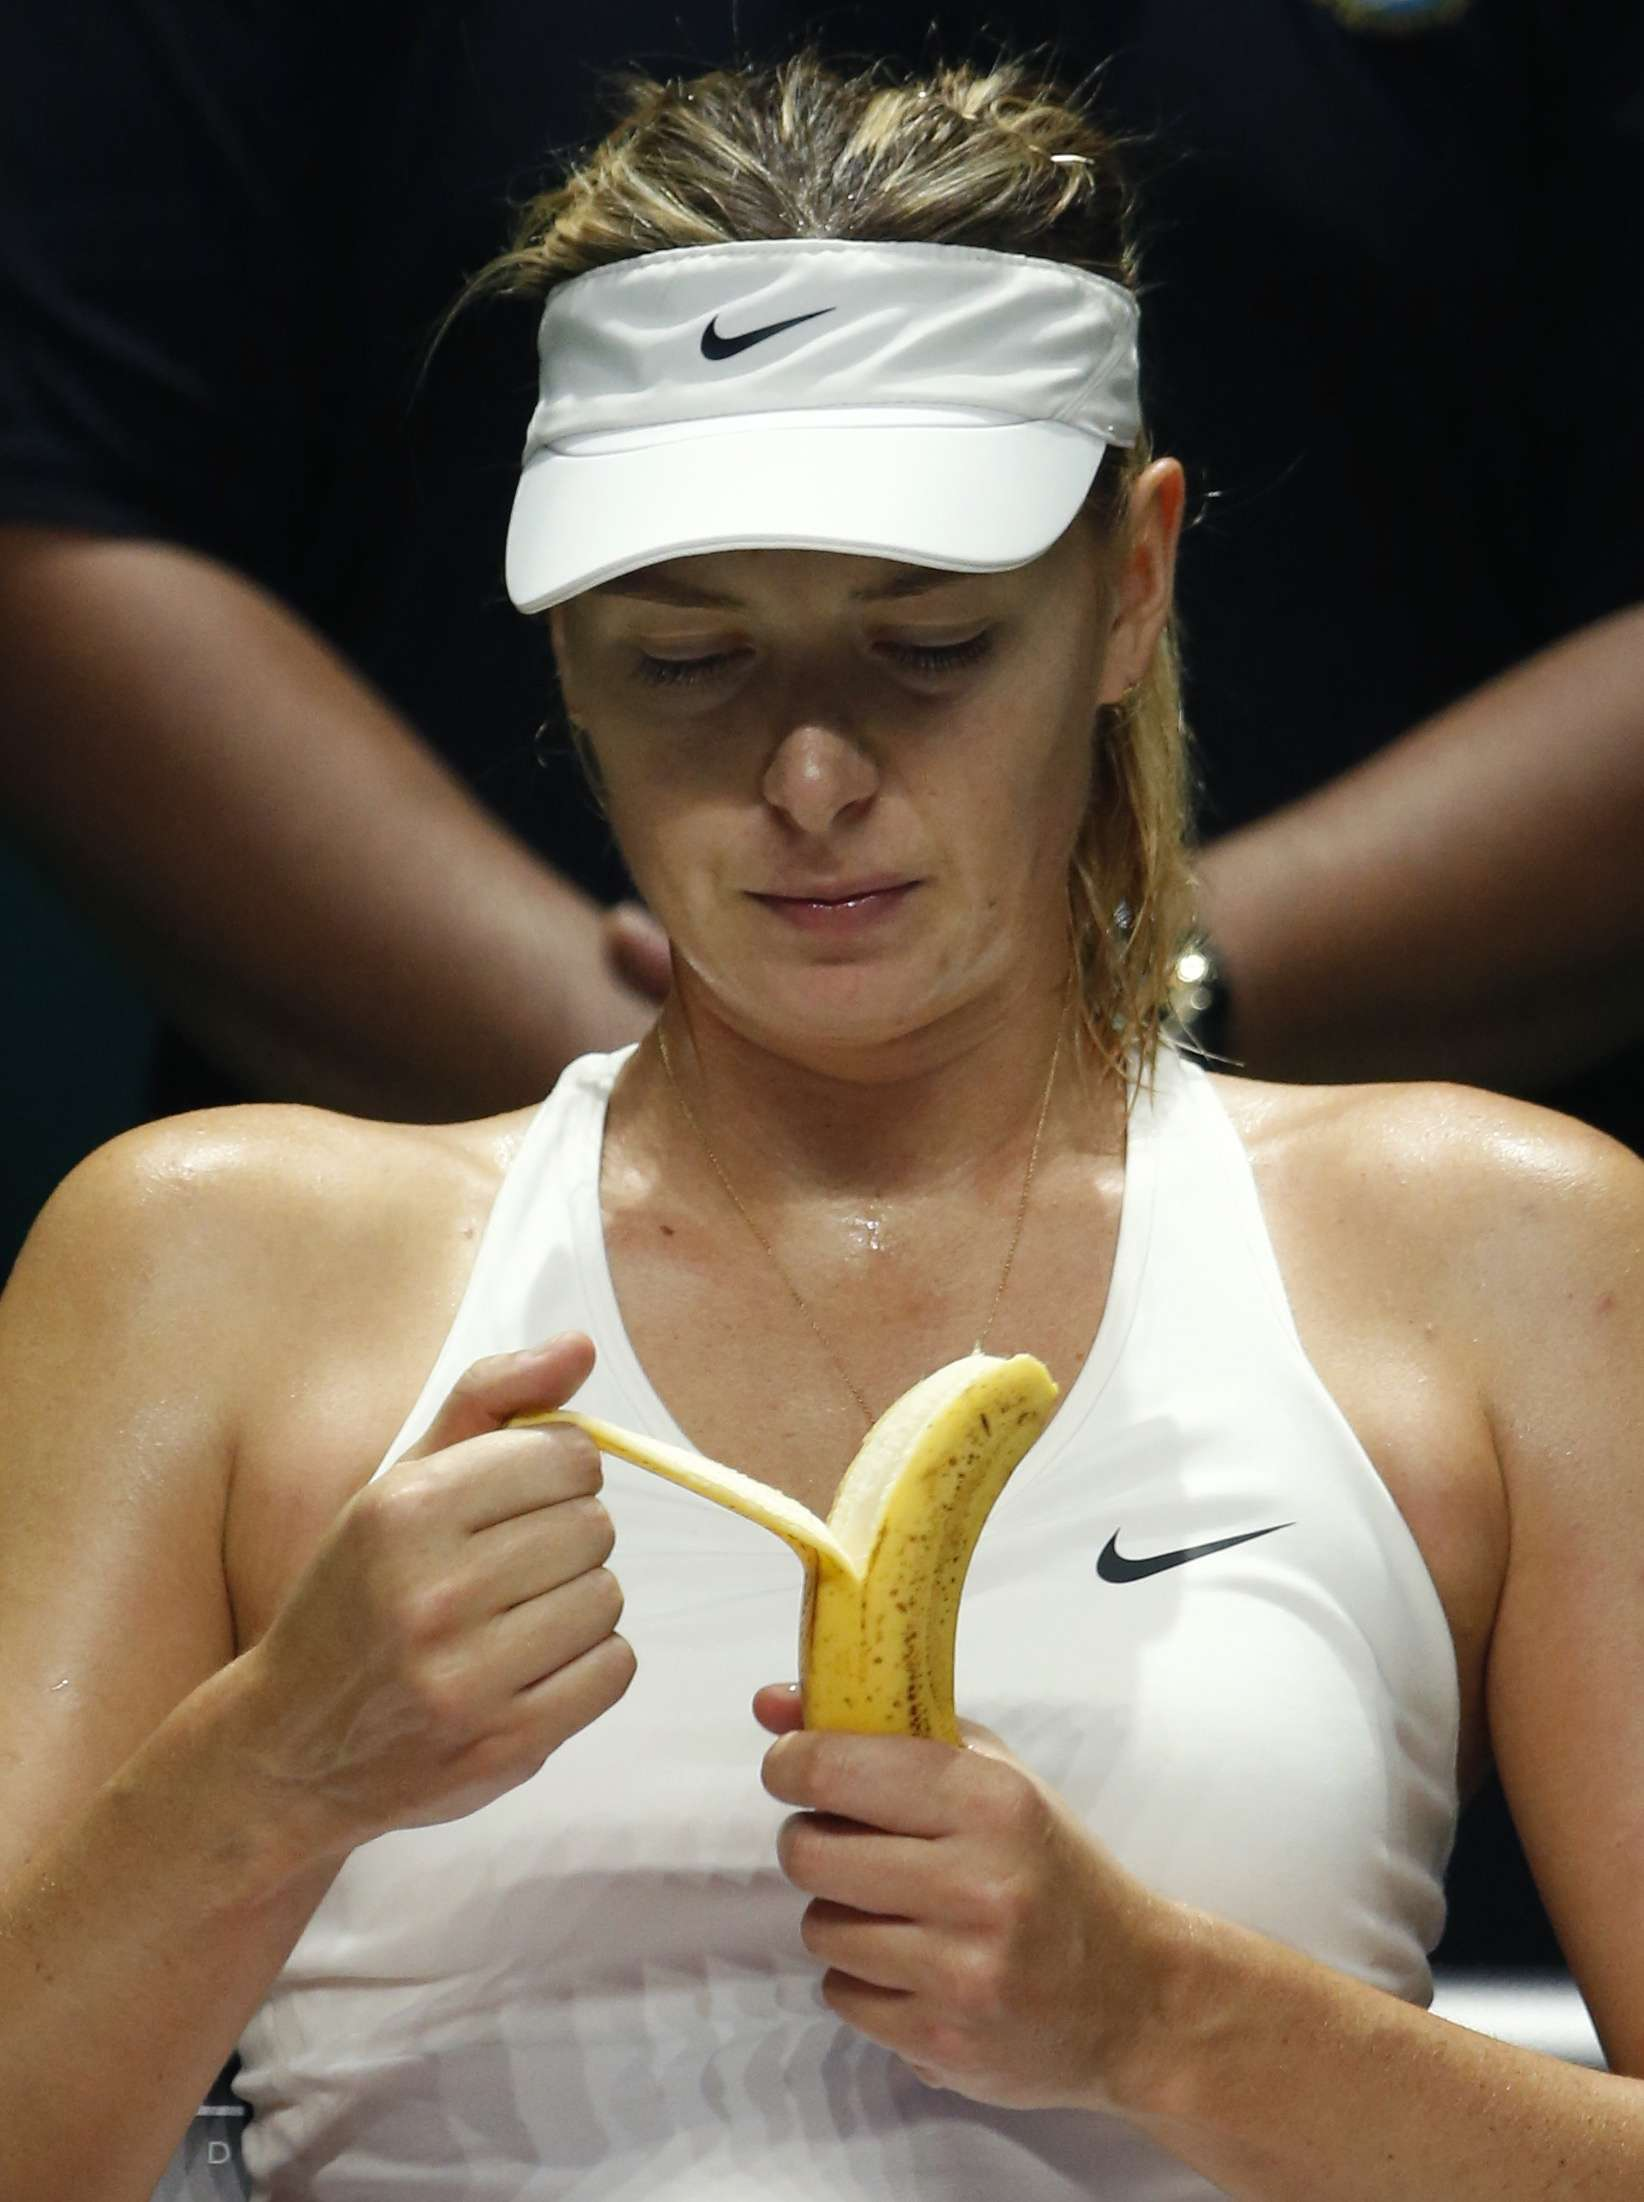 Maria Sharapova comendo banana Foto: Edgar Su/Reuters